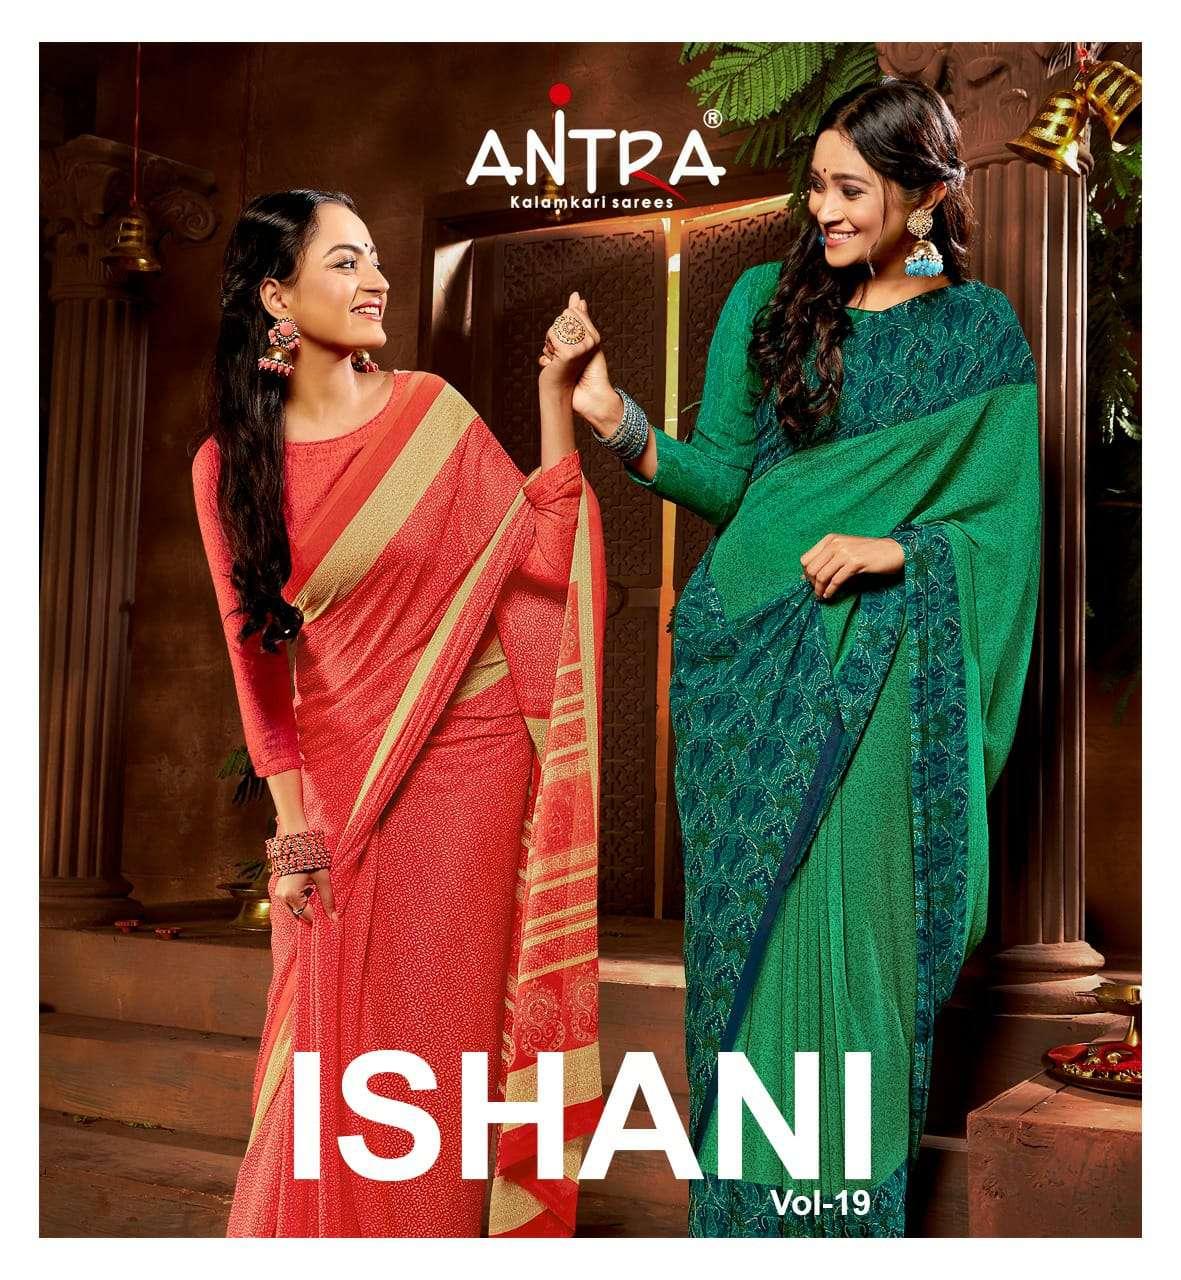 Antra Ishani Vol 19 Printed Chiffon Ladies Sarees